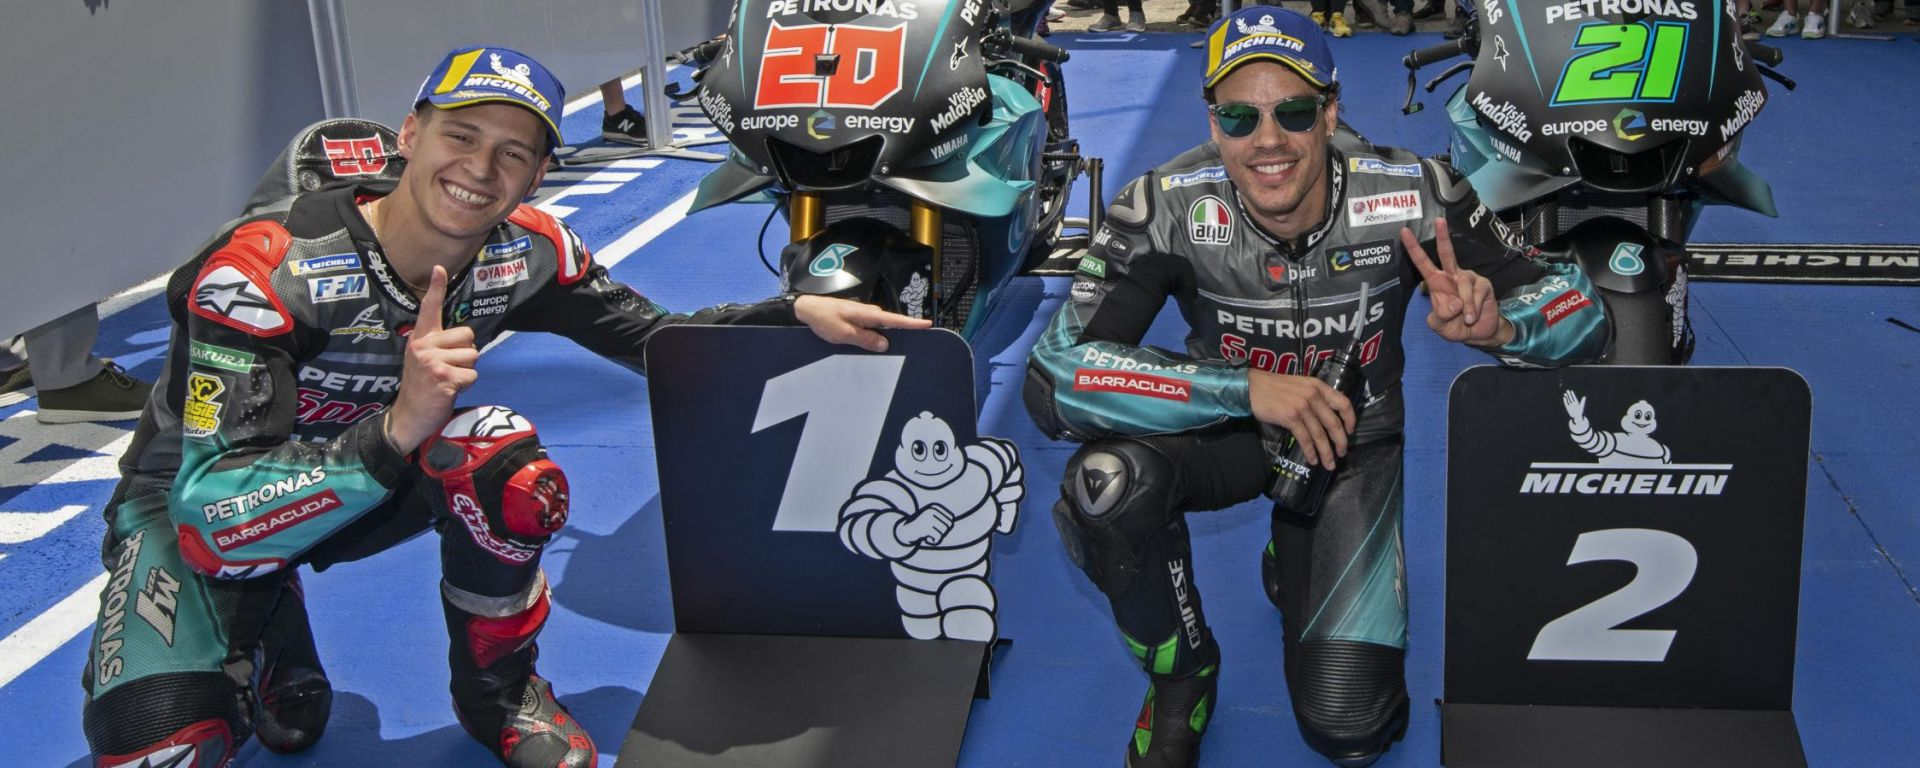 GP Spagna 2019, Fabio Quartararo e Franco Morbidelli (Yamaha)